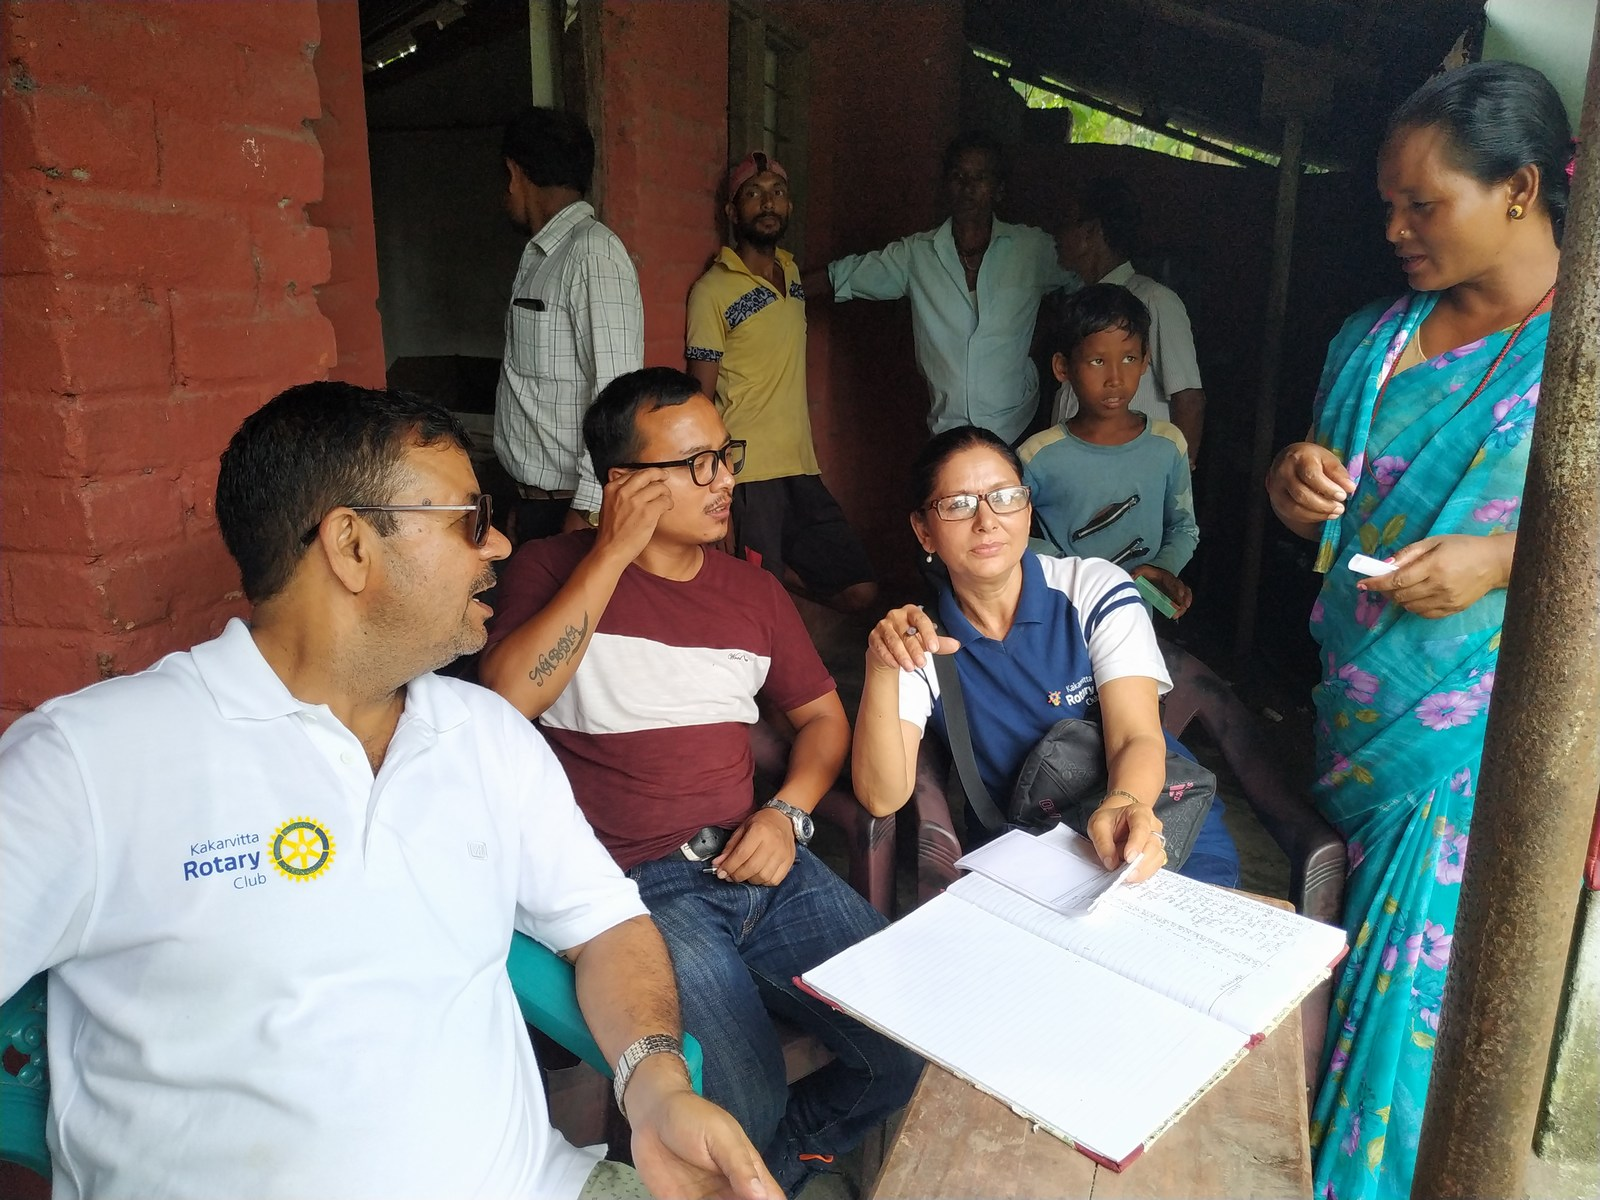 Free-Health-Camp-Eye-Screening-at-Gwala-Basti-Mechinagar-15-Jhapa-Nepal-Rotary-Club-of-Kakarvitta-25